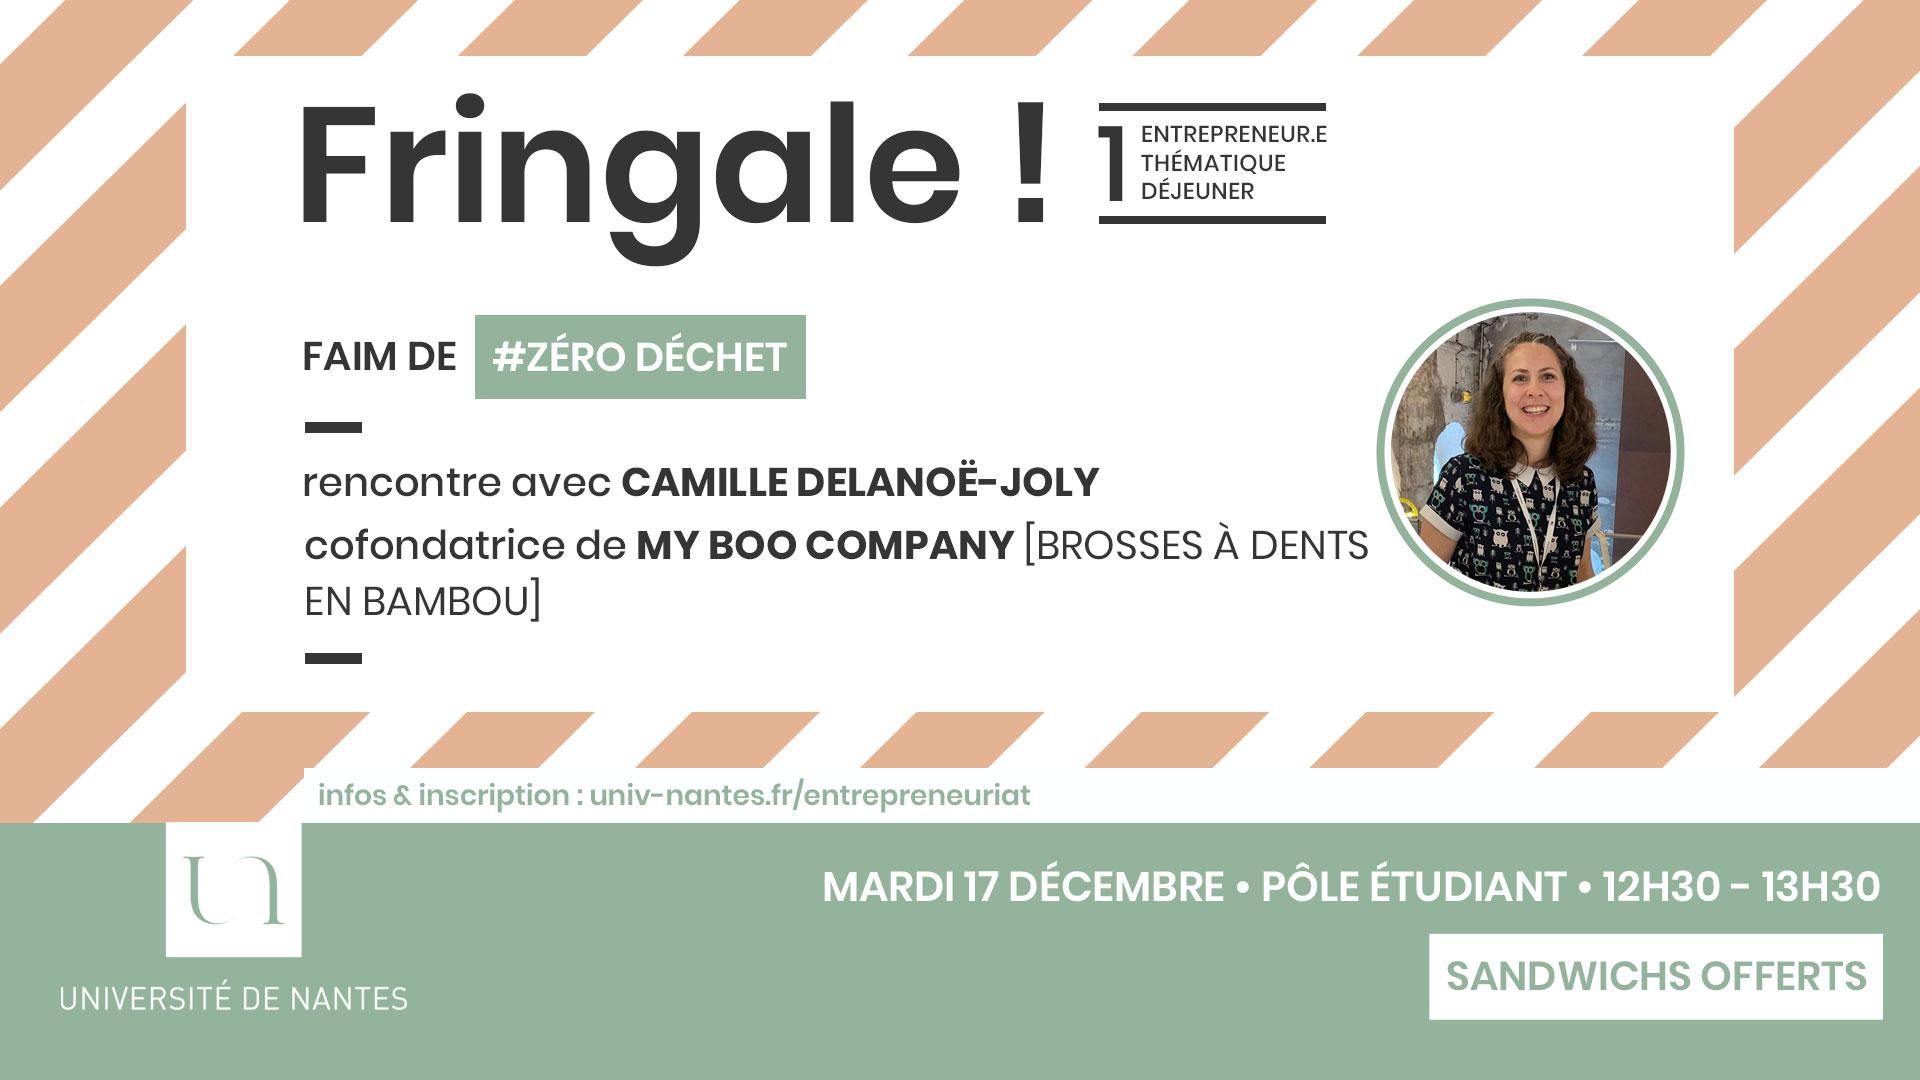 Fringale ! - Université de Nantes - My Boo Company